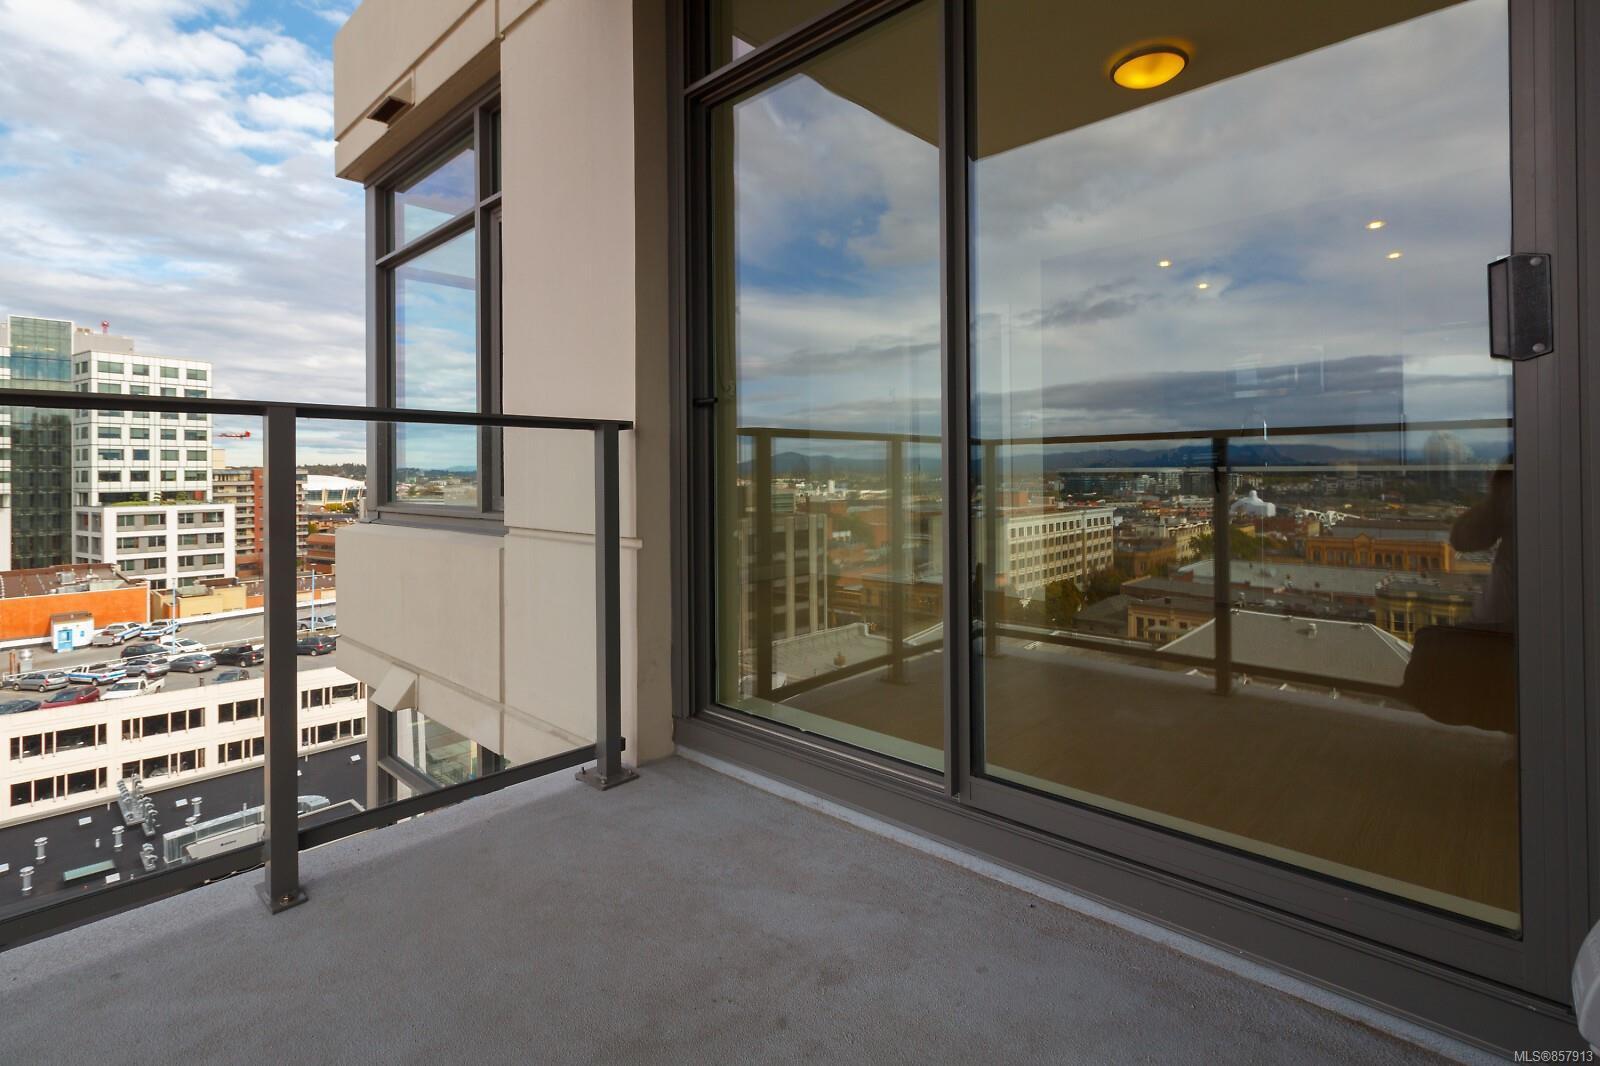 Photo 16: Photos: 1011 728 Yates St in : Vi Downtown Condo for sale (Victoria)  : MLS®# 857913